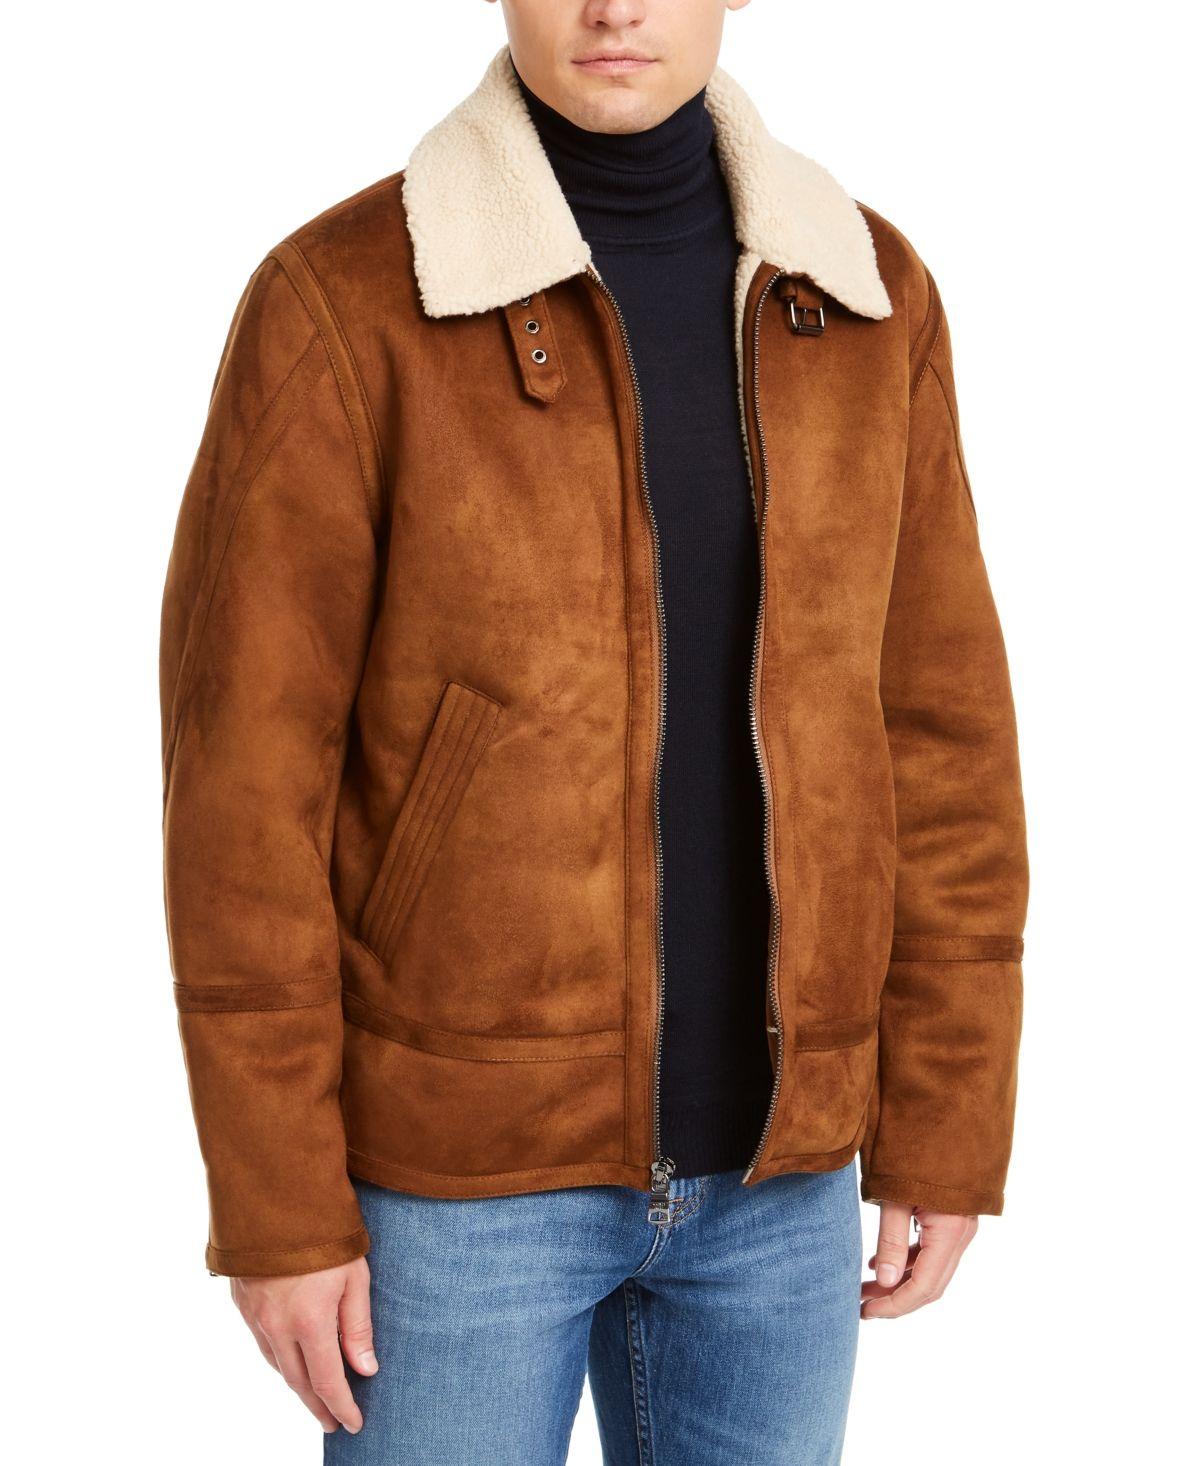 Calvin Klein Men S Faux Short Shearling Jacket Created For Macy S Reviews Coats Jackets Men Macy S In 2021 Jackets Men Fashion Mens Jackets Plus Size Men Outfits [ 1466 x 1200 Pixel ]